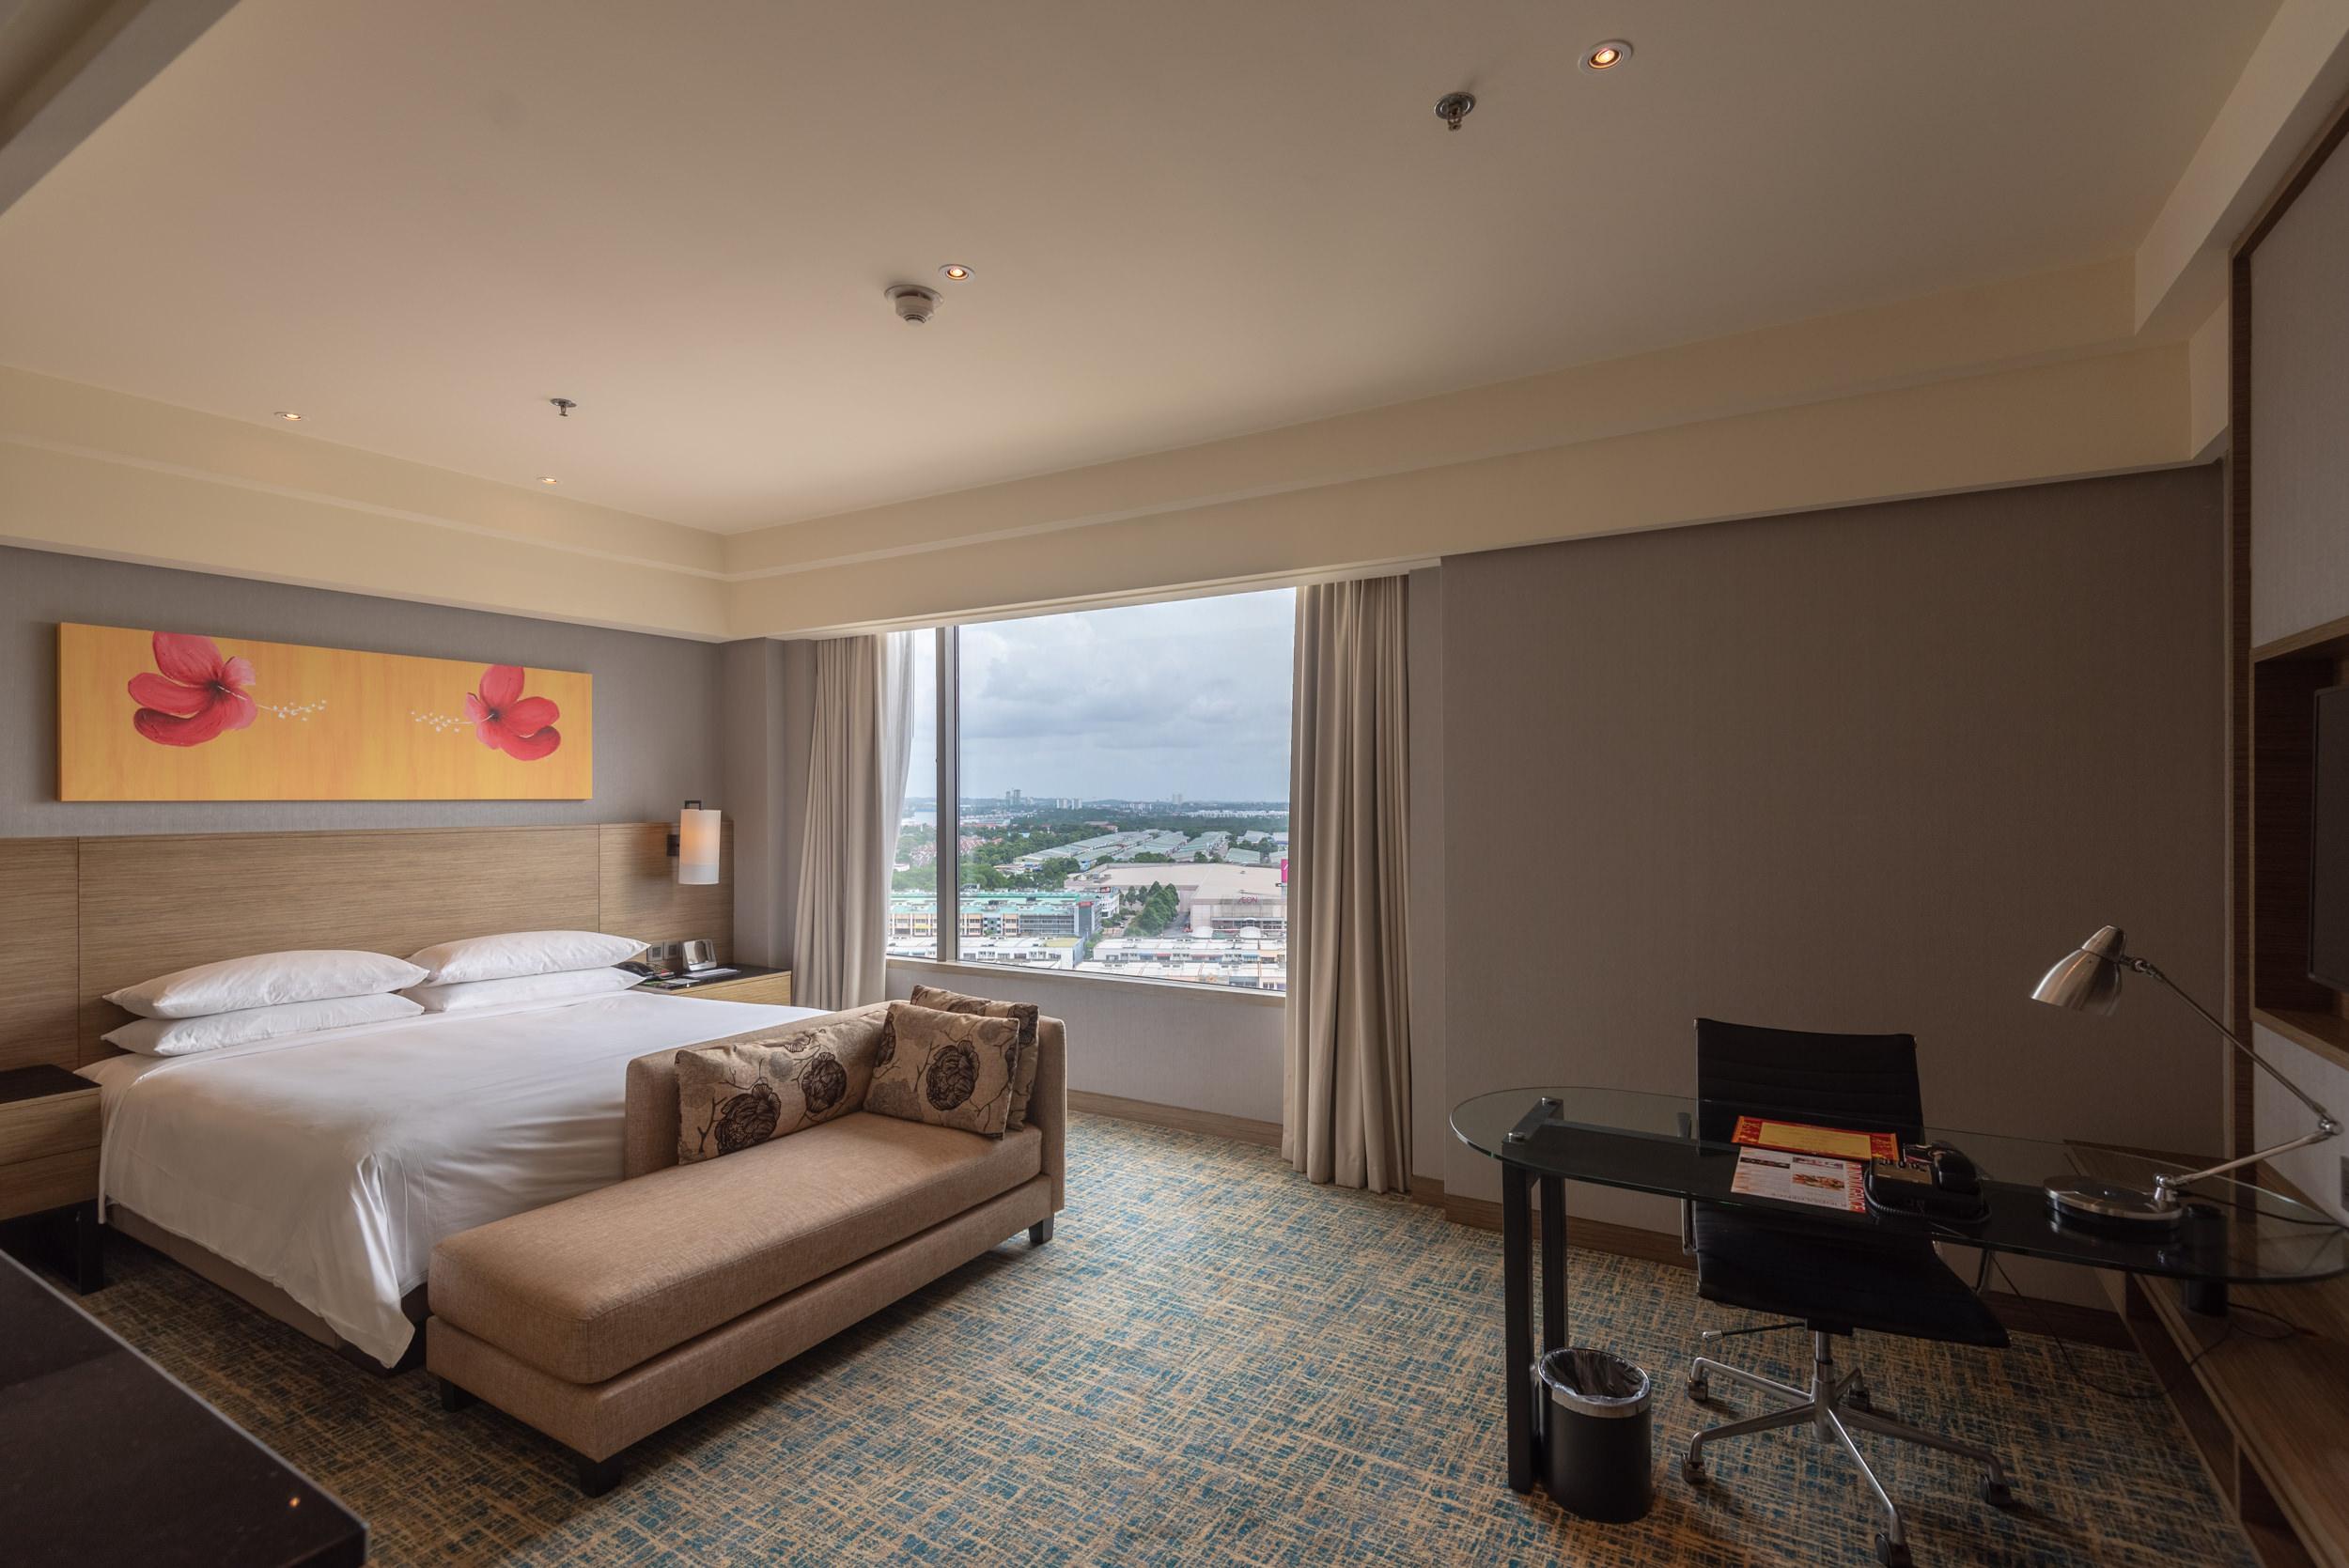 Hotel Review: Renaissance Johor Bahru Hotel (Club Room) - Great